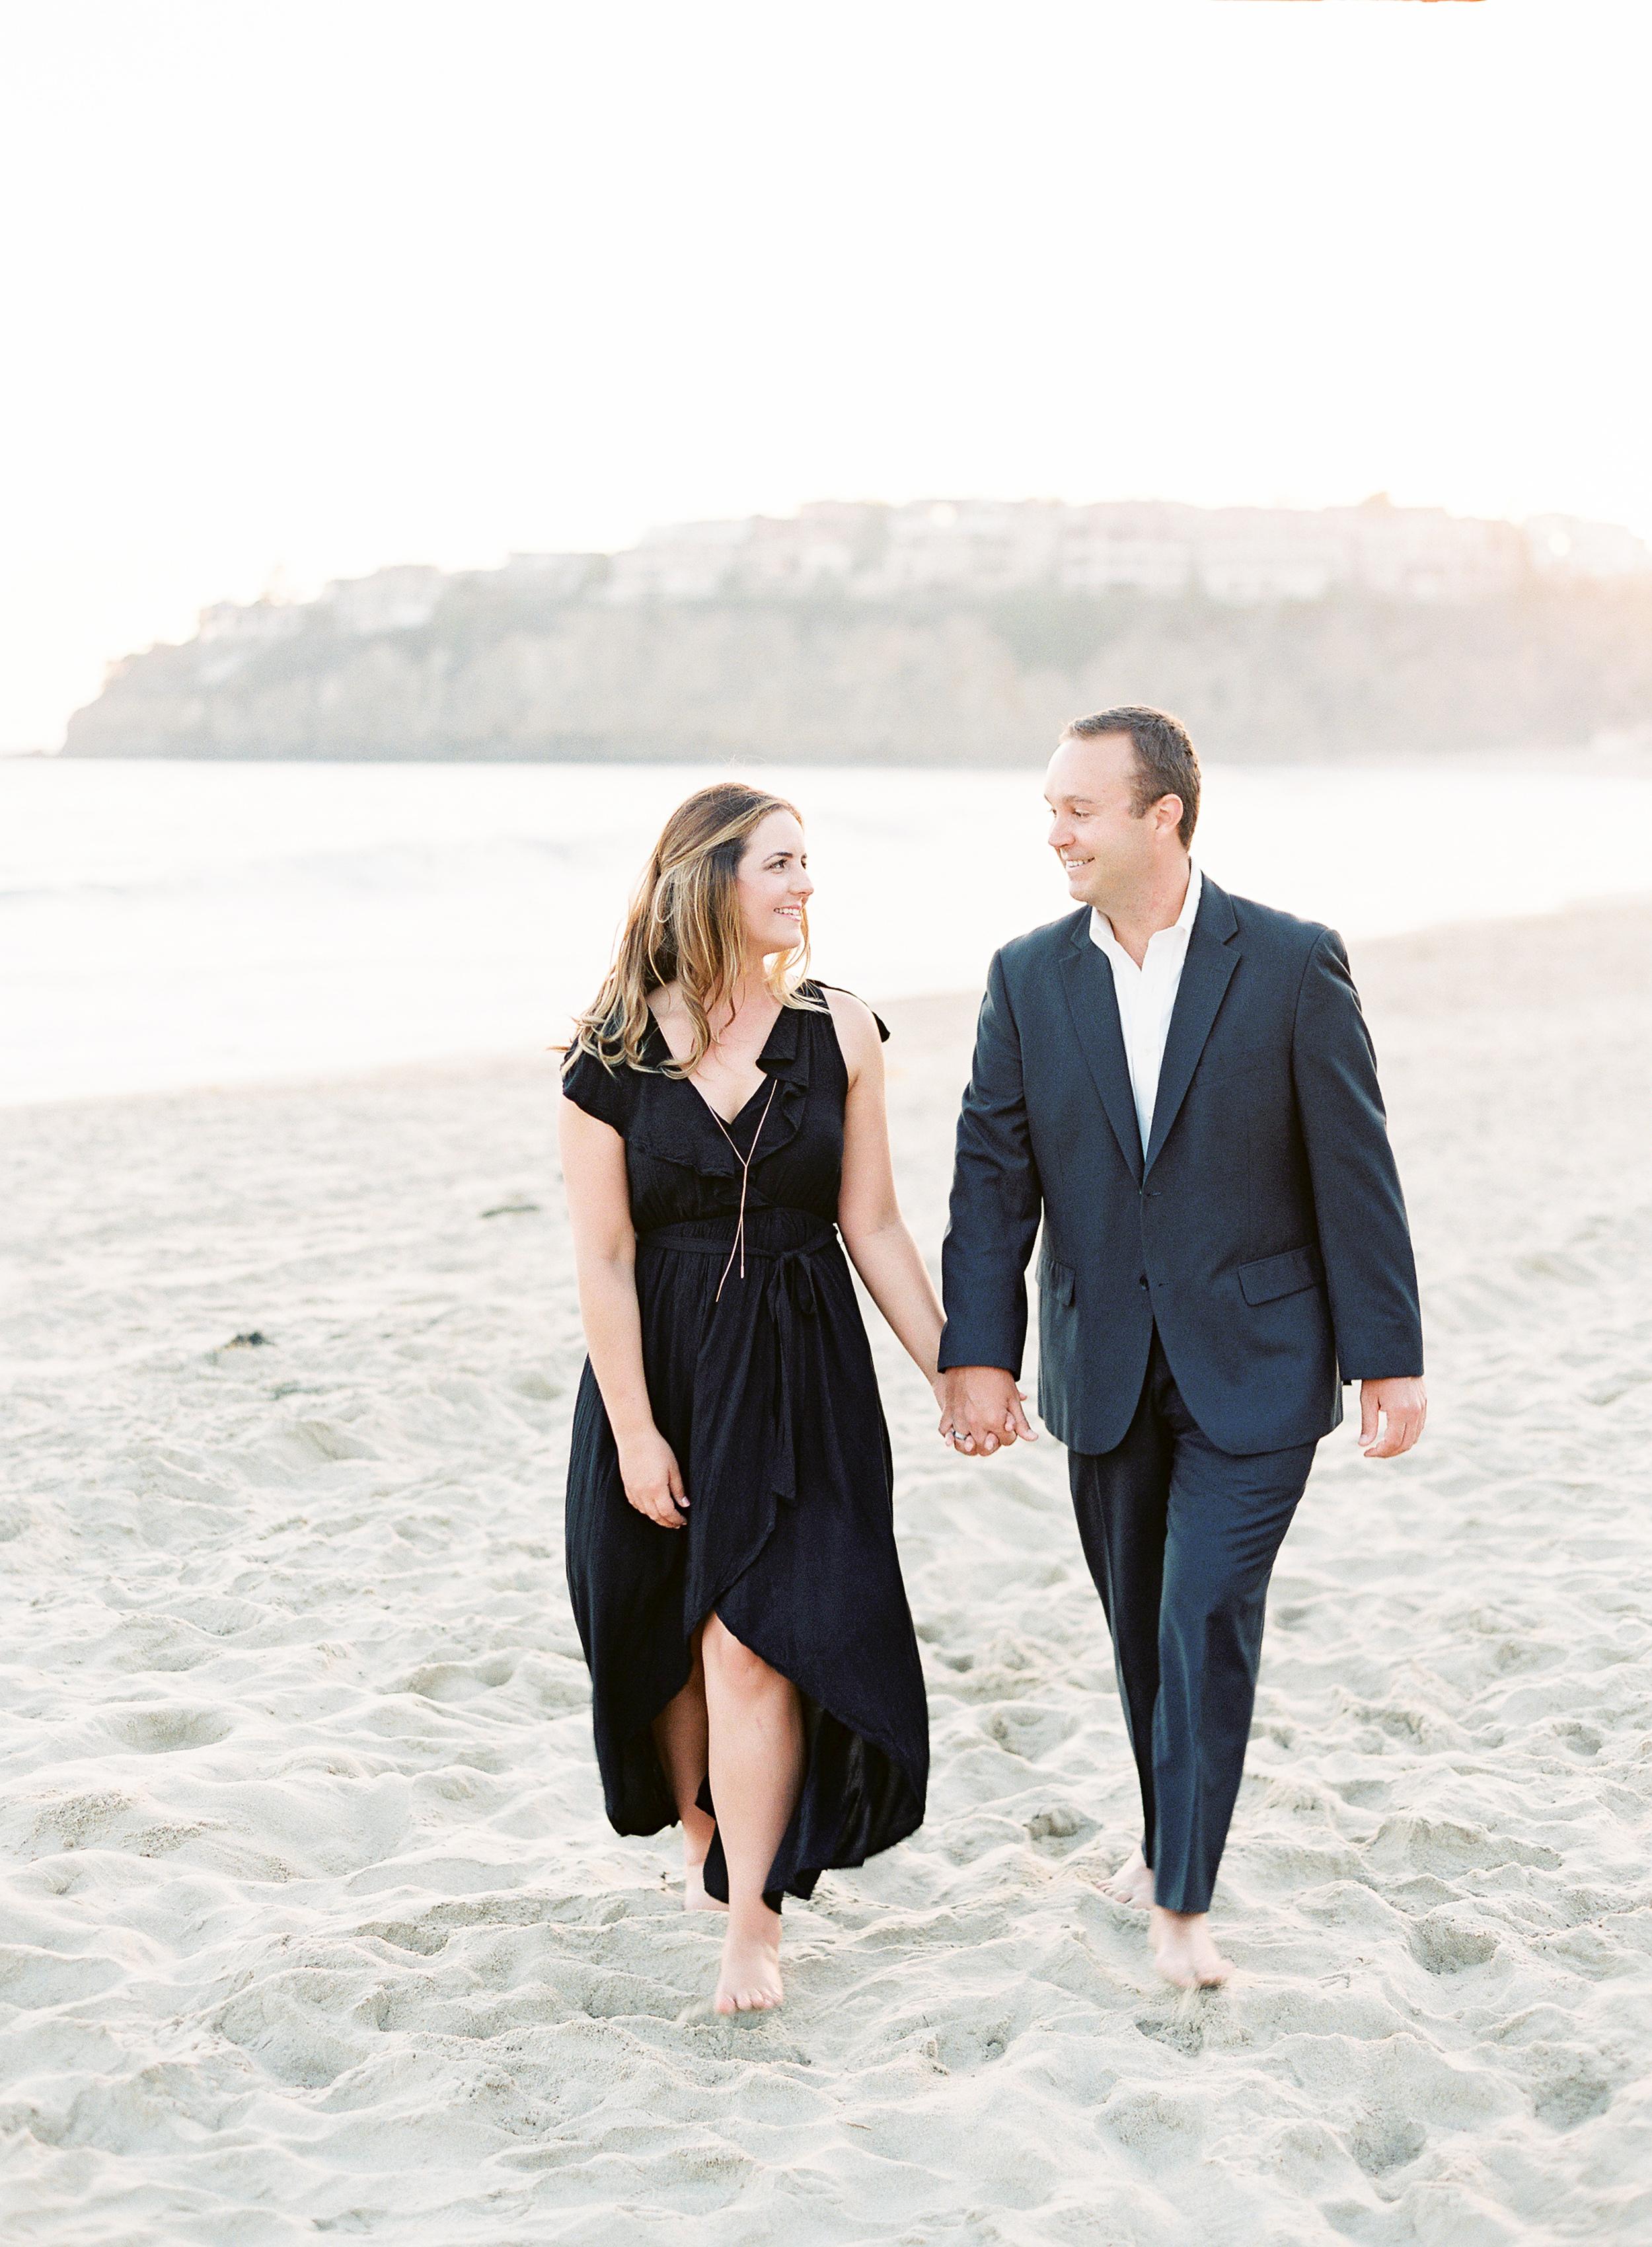 Laguna-Beach-Engagement-Film-Wedding-Orange-County-91.jpg